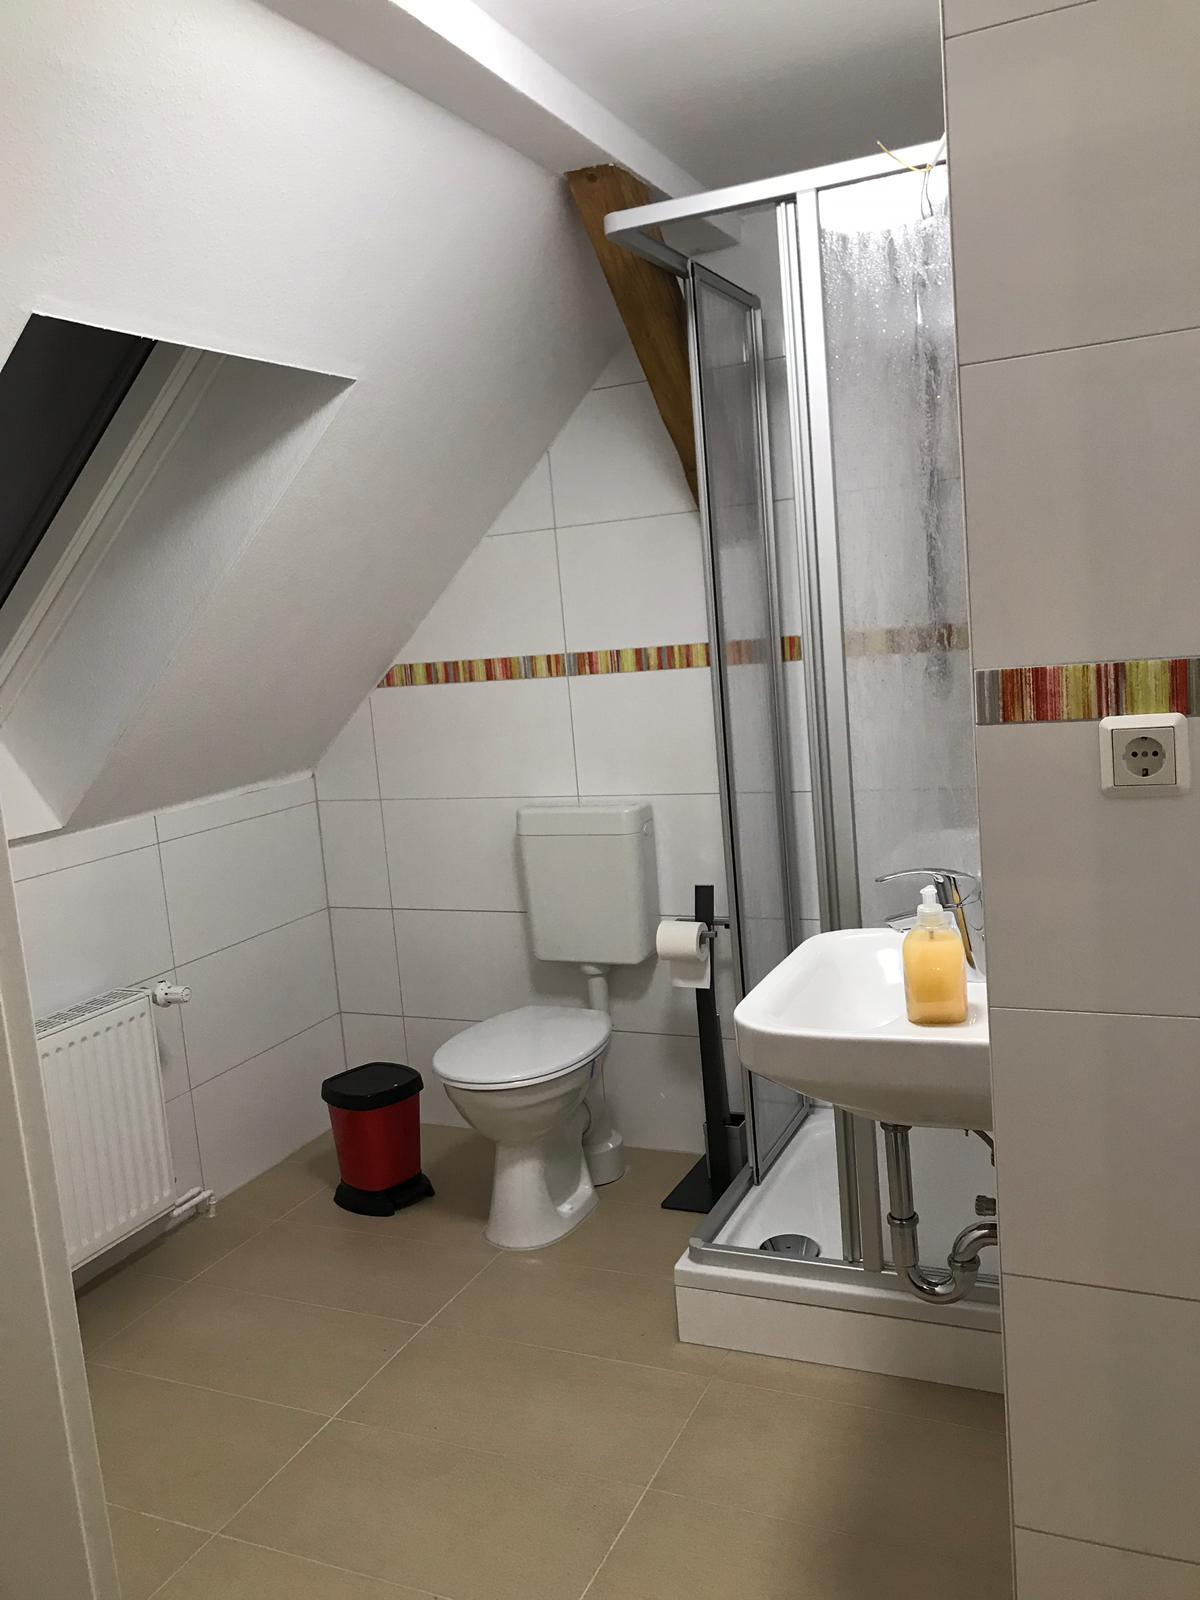 WC / Dusche 2. Etage